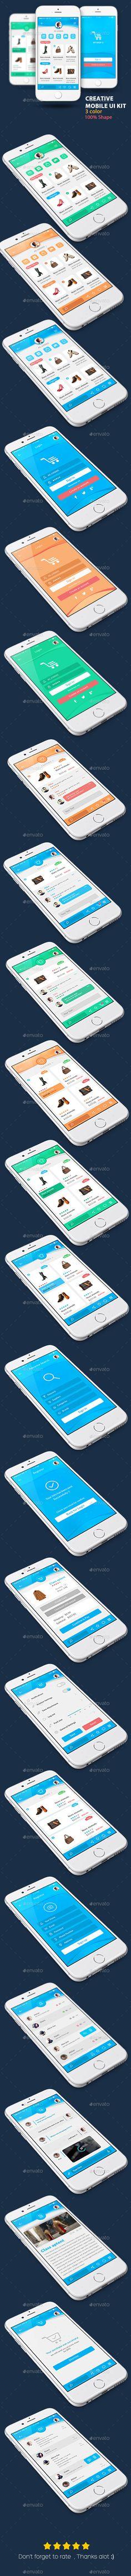 Shop Creative Mobile UI #design Download: http://graphicriver.net/item/shop-creative-mobile-ui/12616160?ref=ksioks